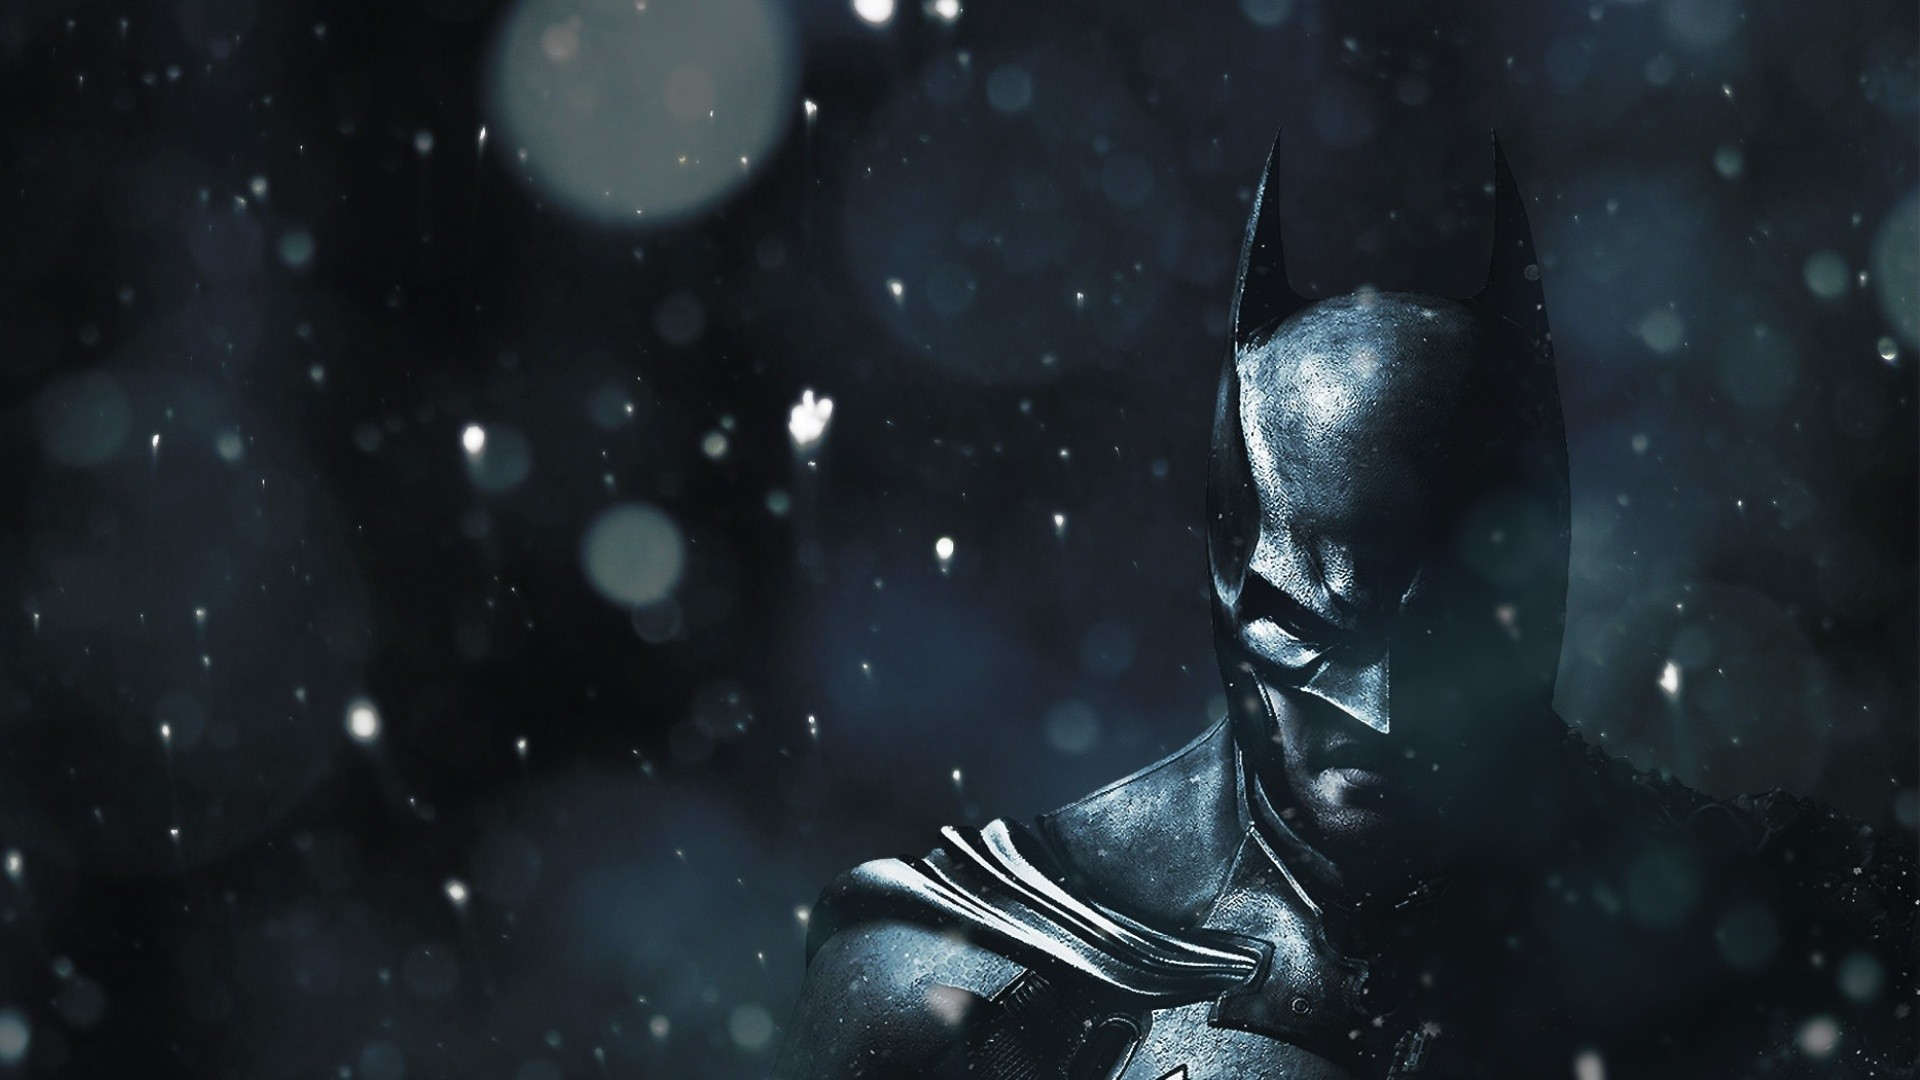 50 Batman Logo wallpapers For Download HD 1080p 1920x1080